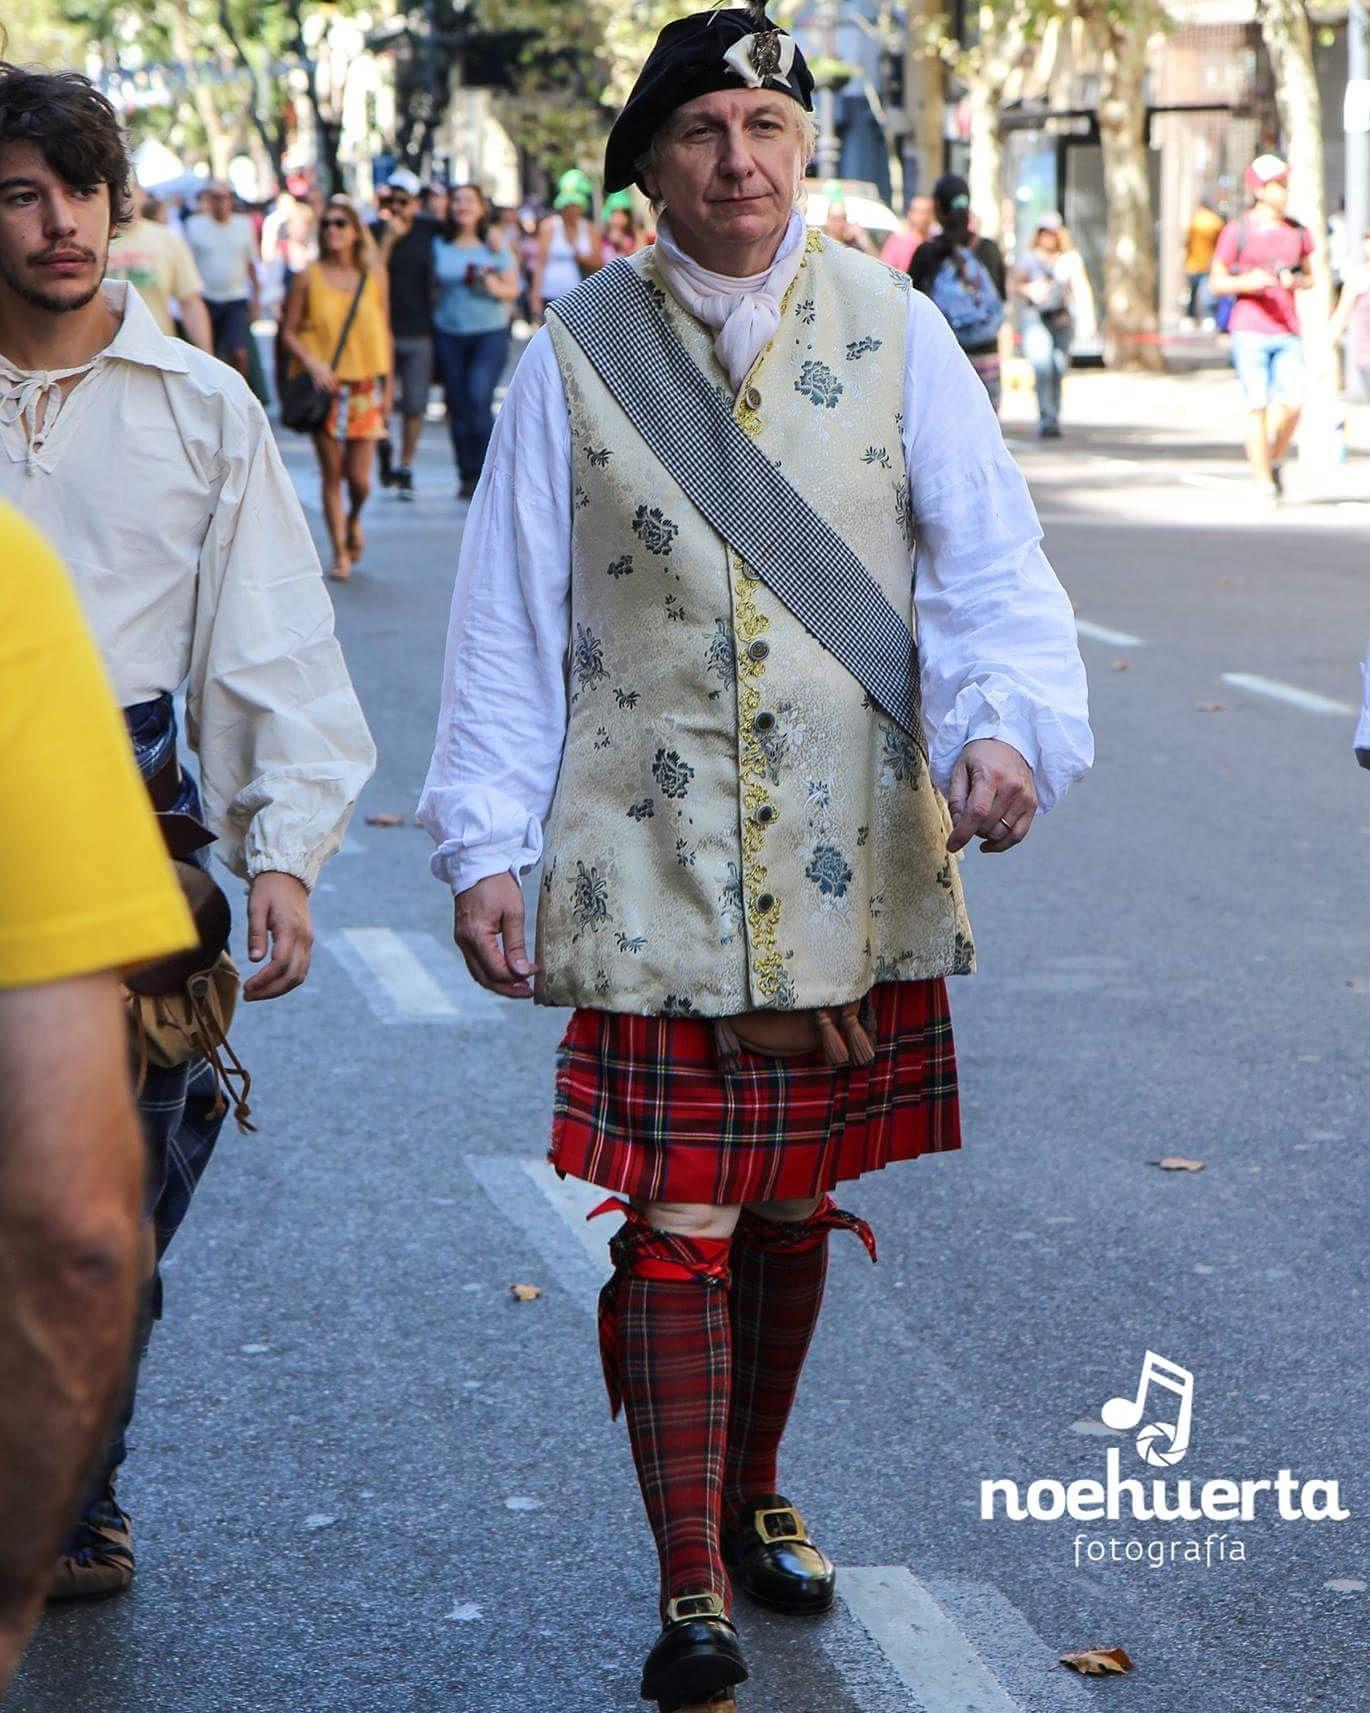 BA celebra Irlanda Y Escocia  by Noe Huerta